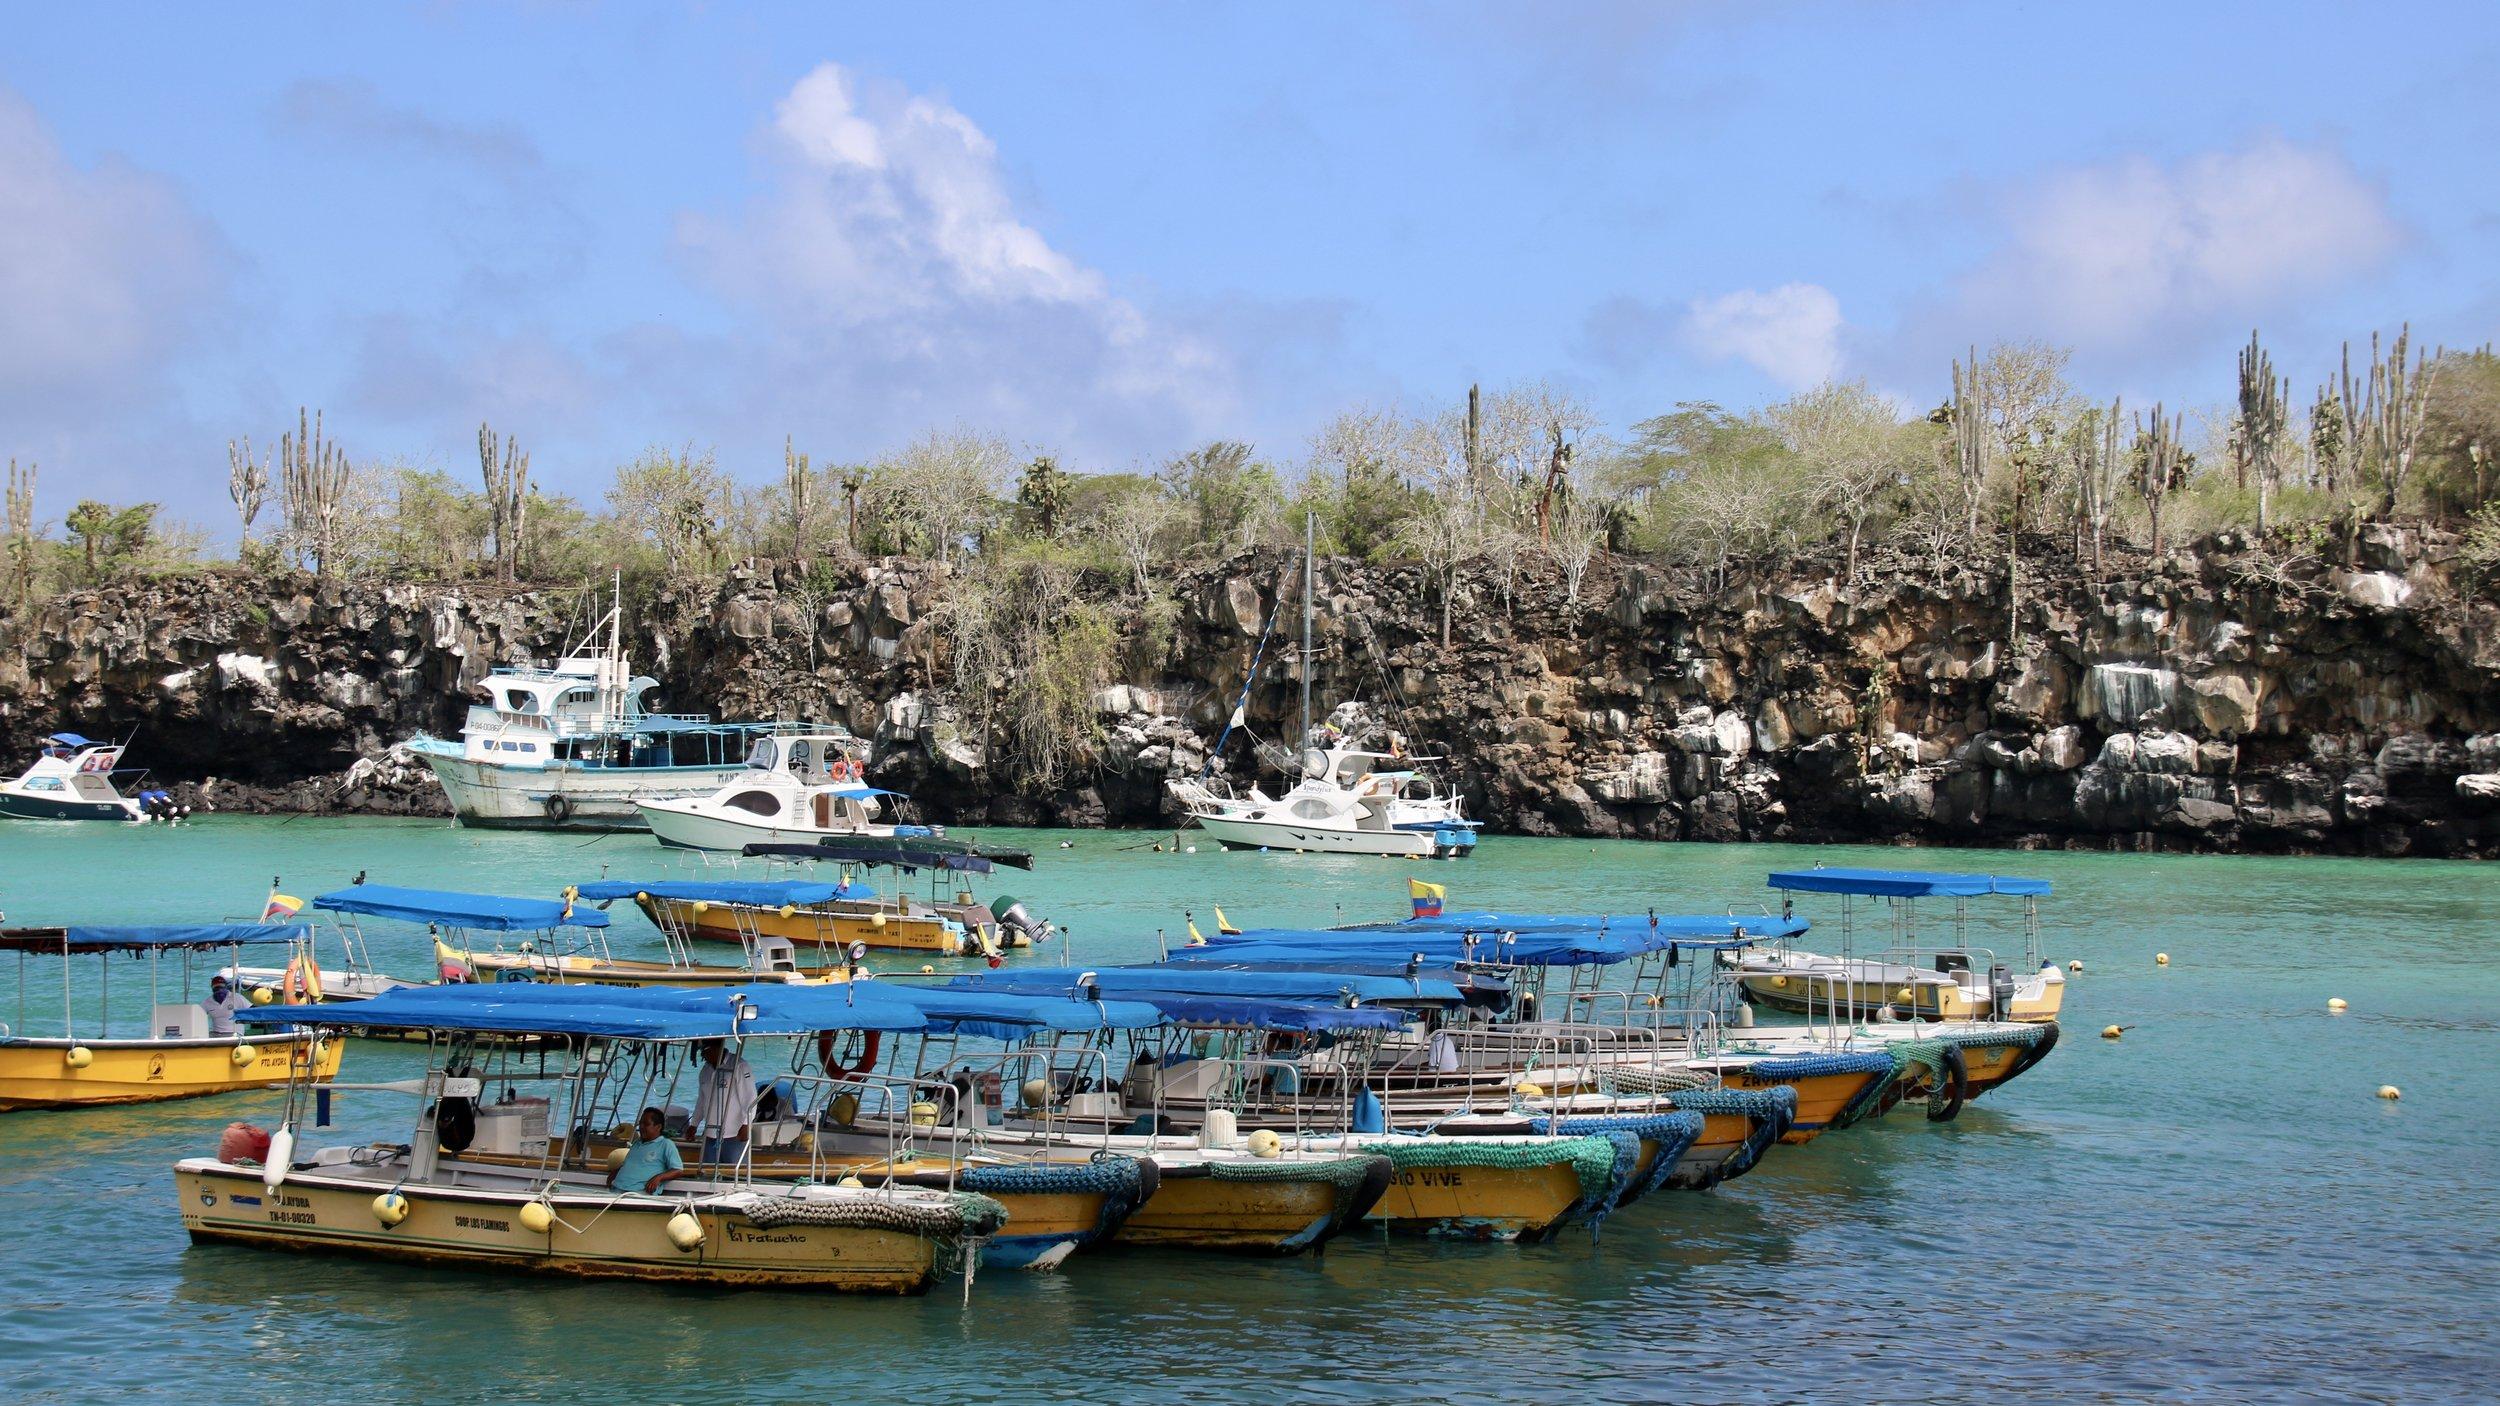 Boats at Santa Cruz port, Galapagos islands, @acrosslandsea